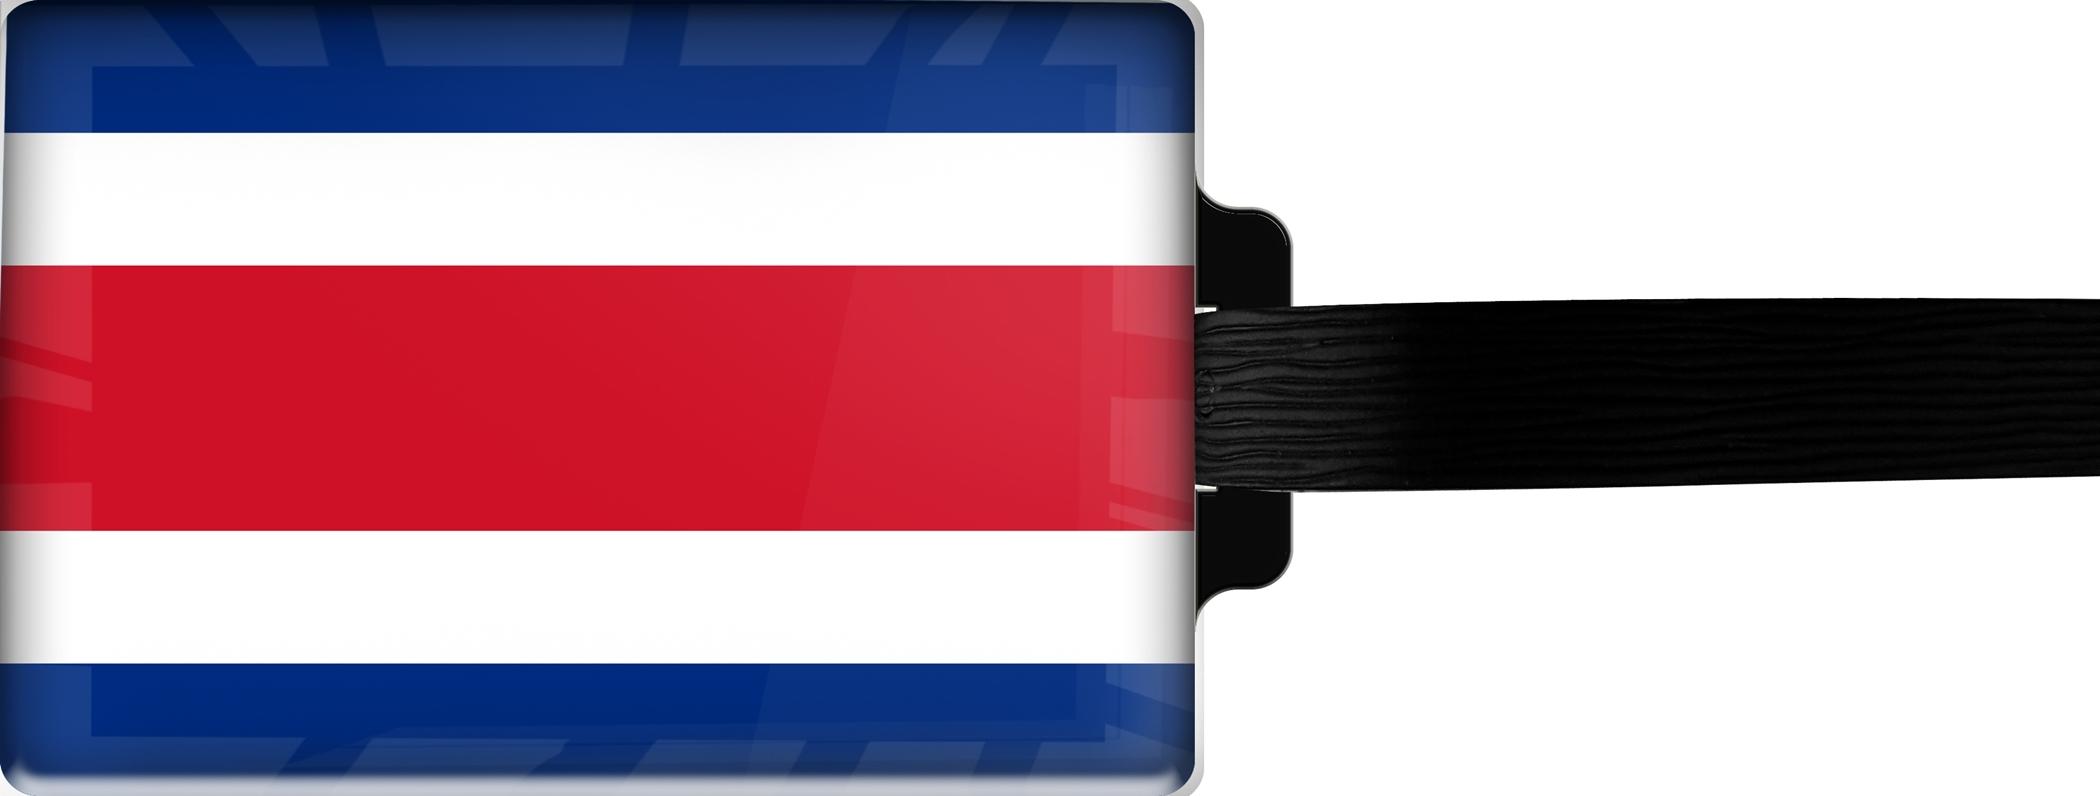 Hochwertiger Gepäckanhänger aus Acrylglas | FLAGGE COSTA RICA | metALUm #00085